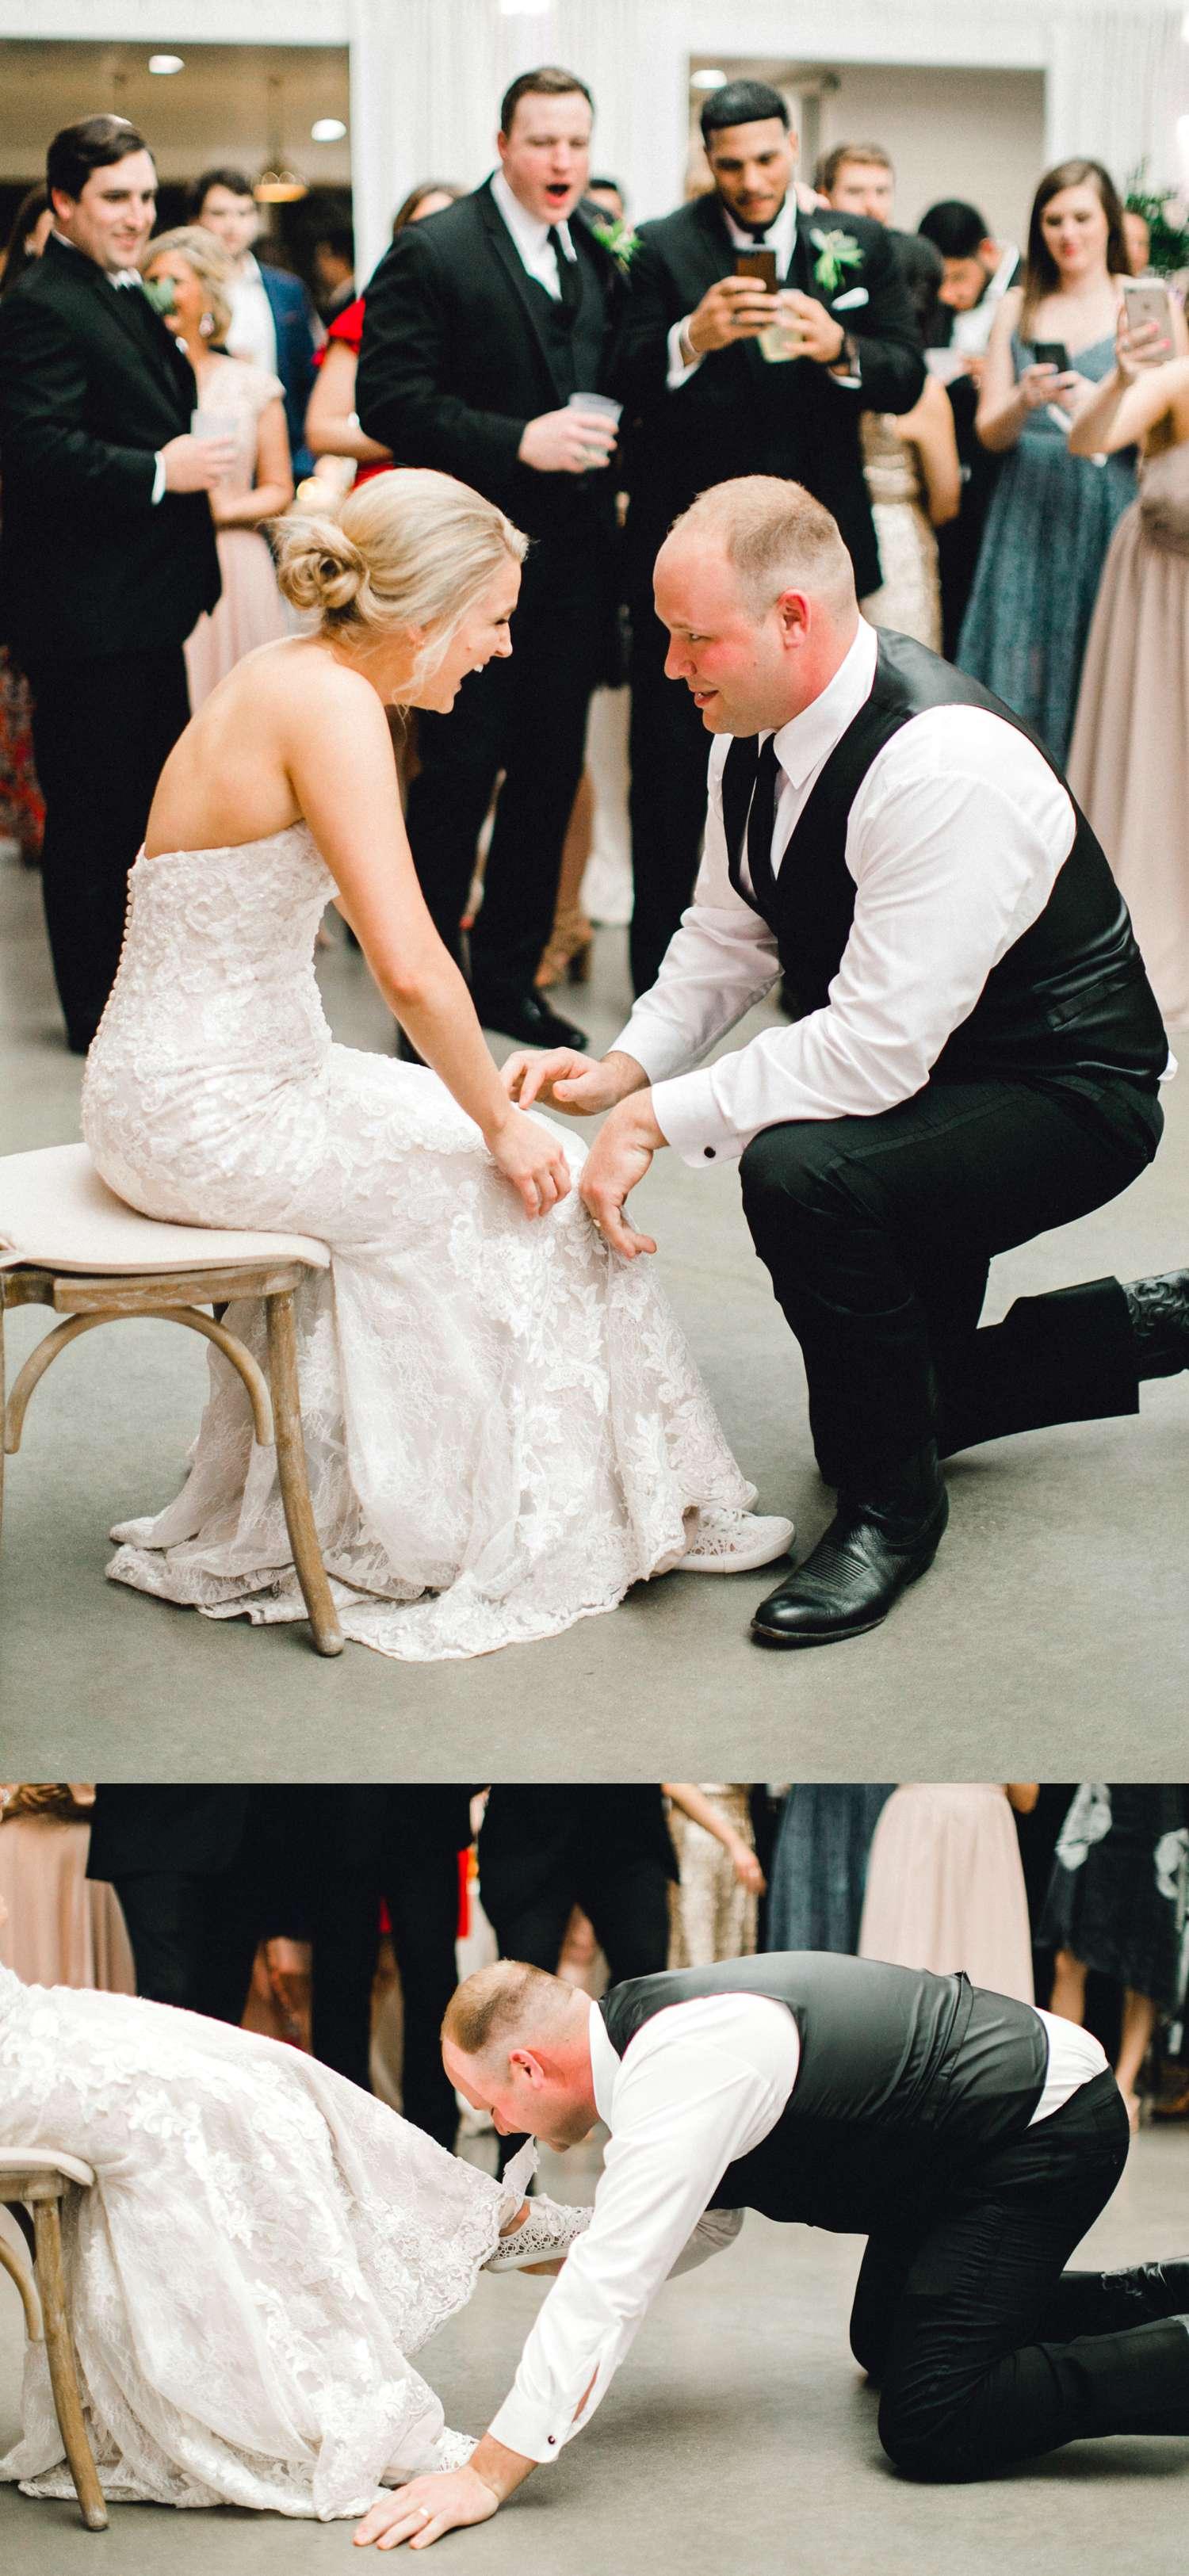 HEBERT_MORGAN_AND_CLAY_ALLEEJ_THE_FARMHOUSE_MONTGOMERY_TEXAS_WEDDING_0207.jpg